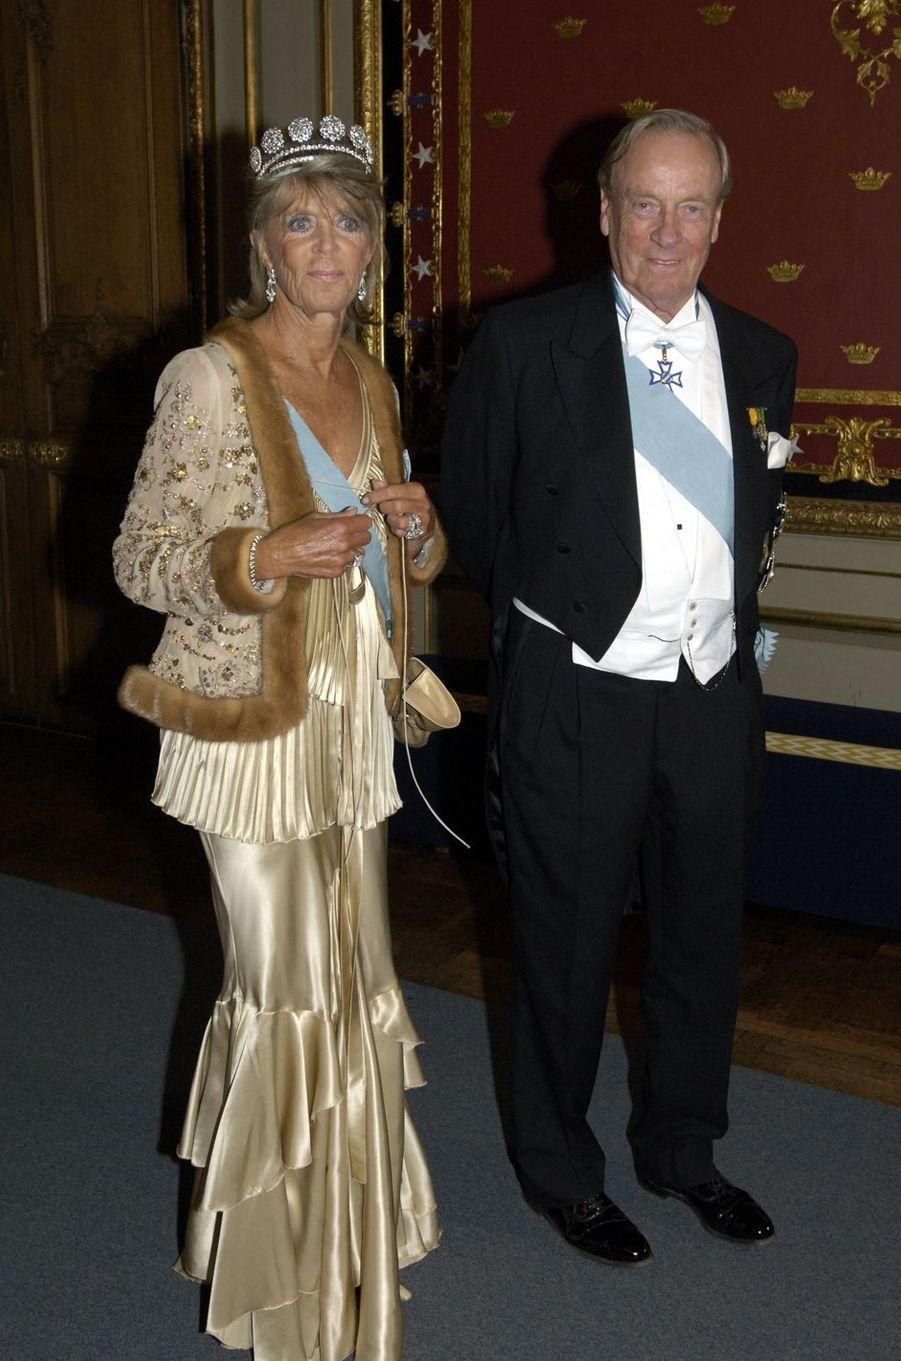 La princesse Birgitta de Suède avec son mari, le 30 avril 2006